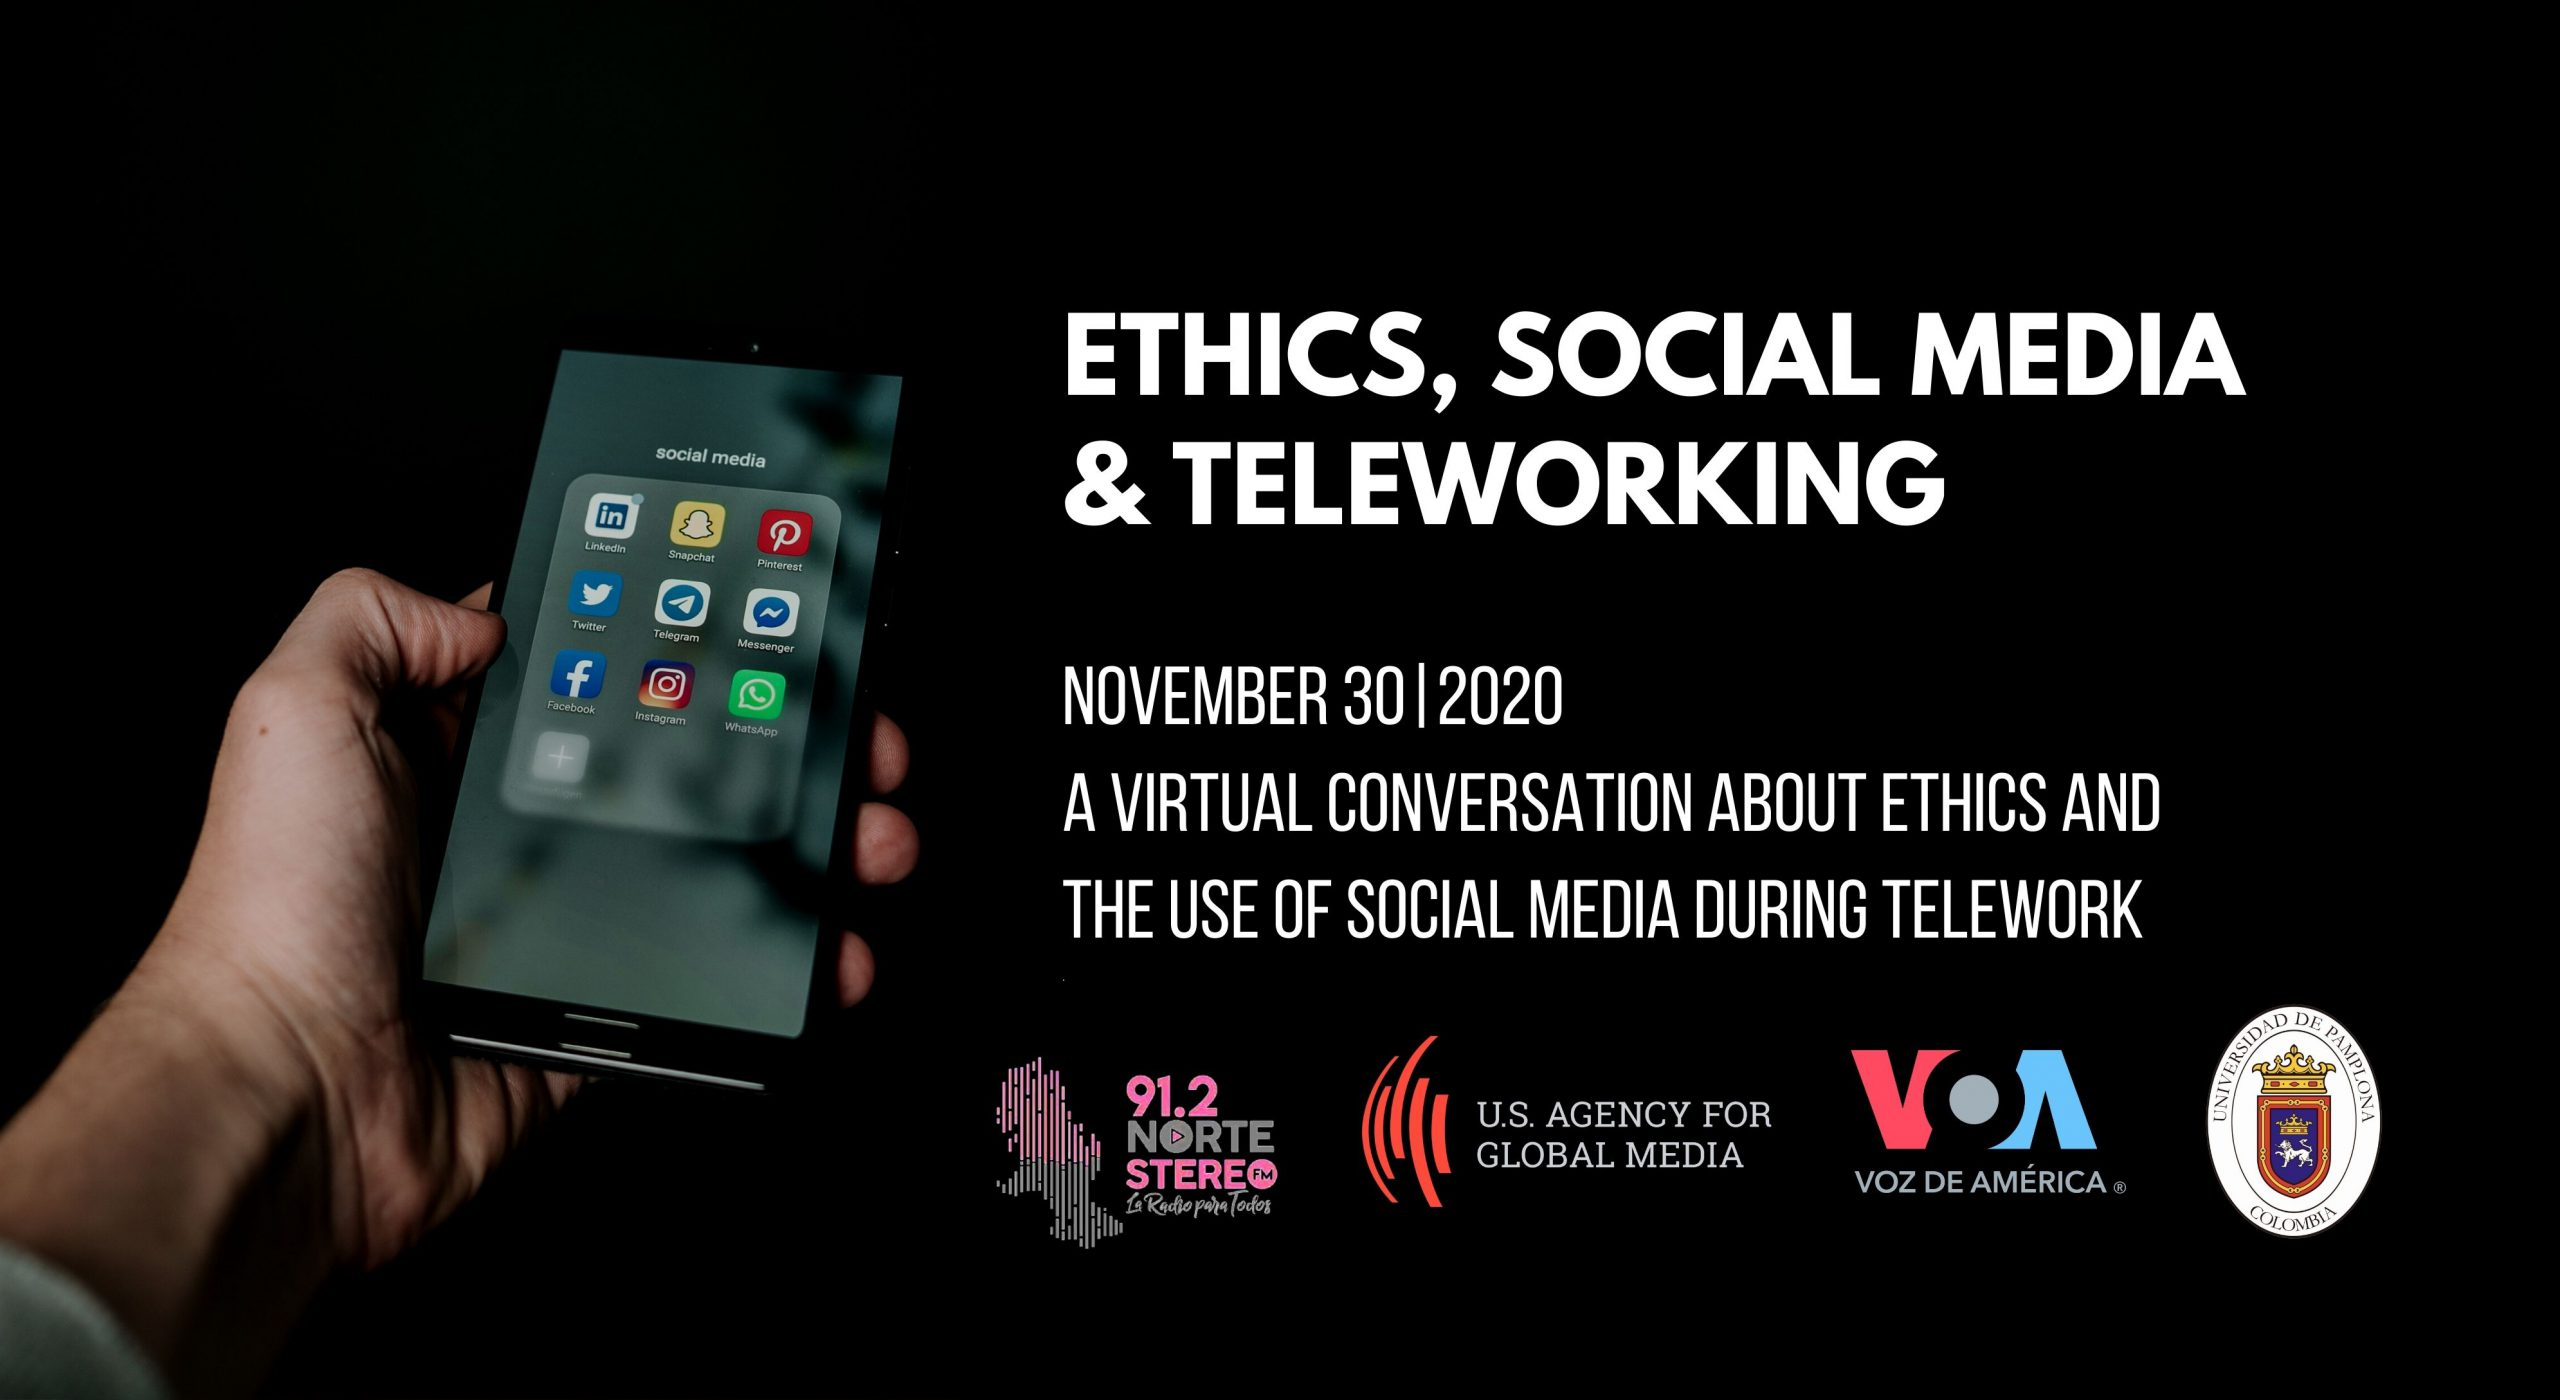 Latin America: Ethics, Social Media and Teleworking